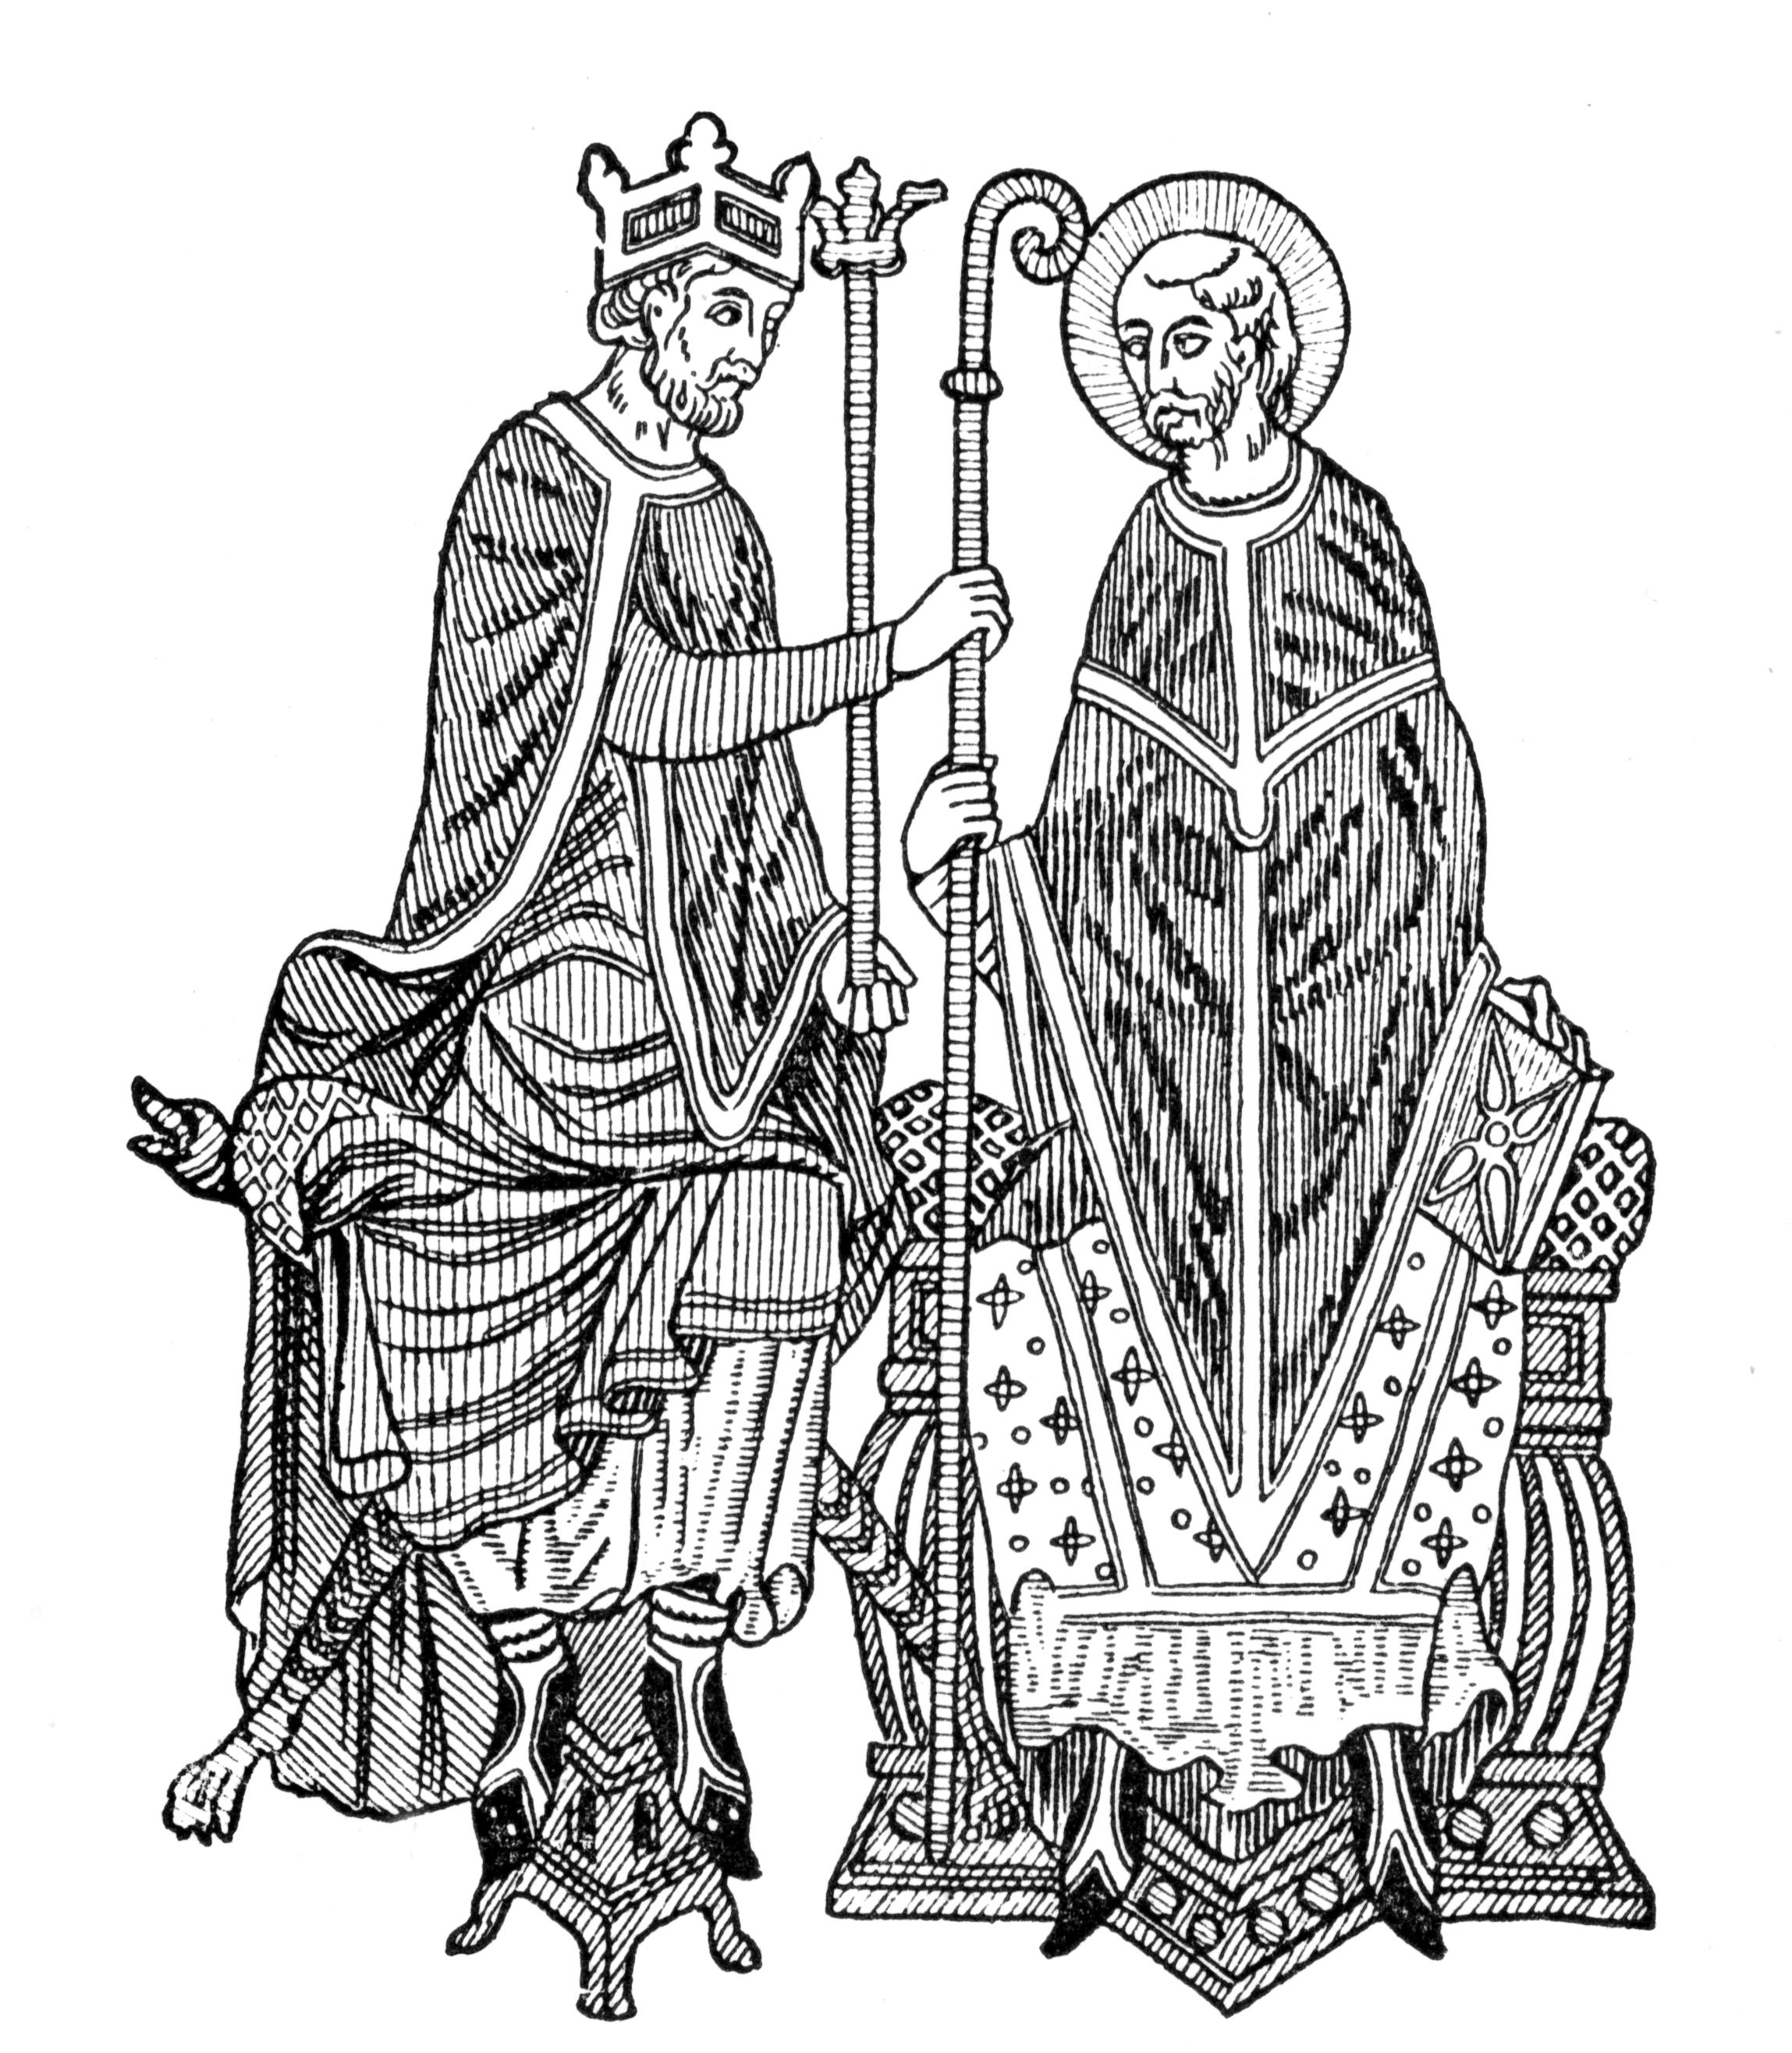 Medieval King And Bishop | Free Images at Clker.com - vector clip ...